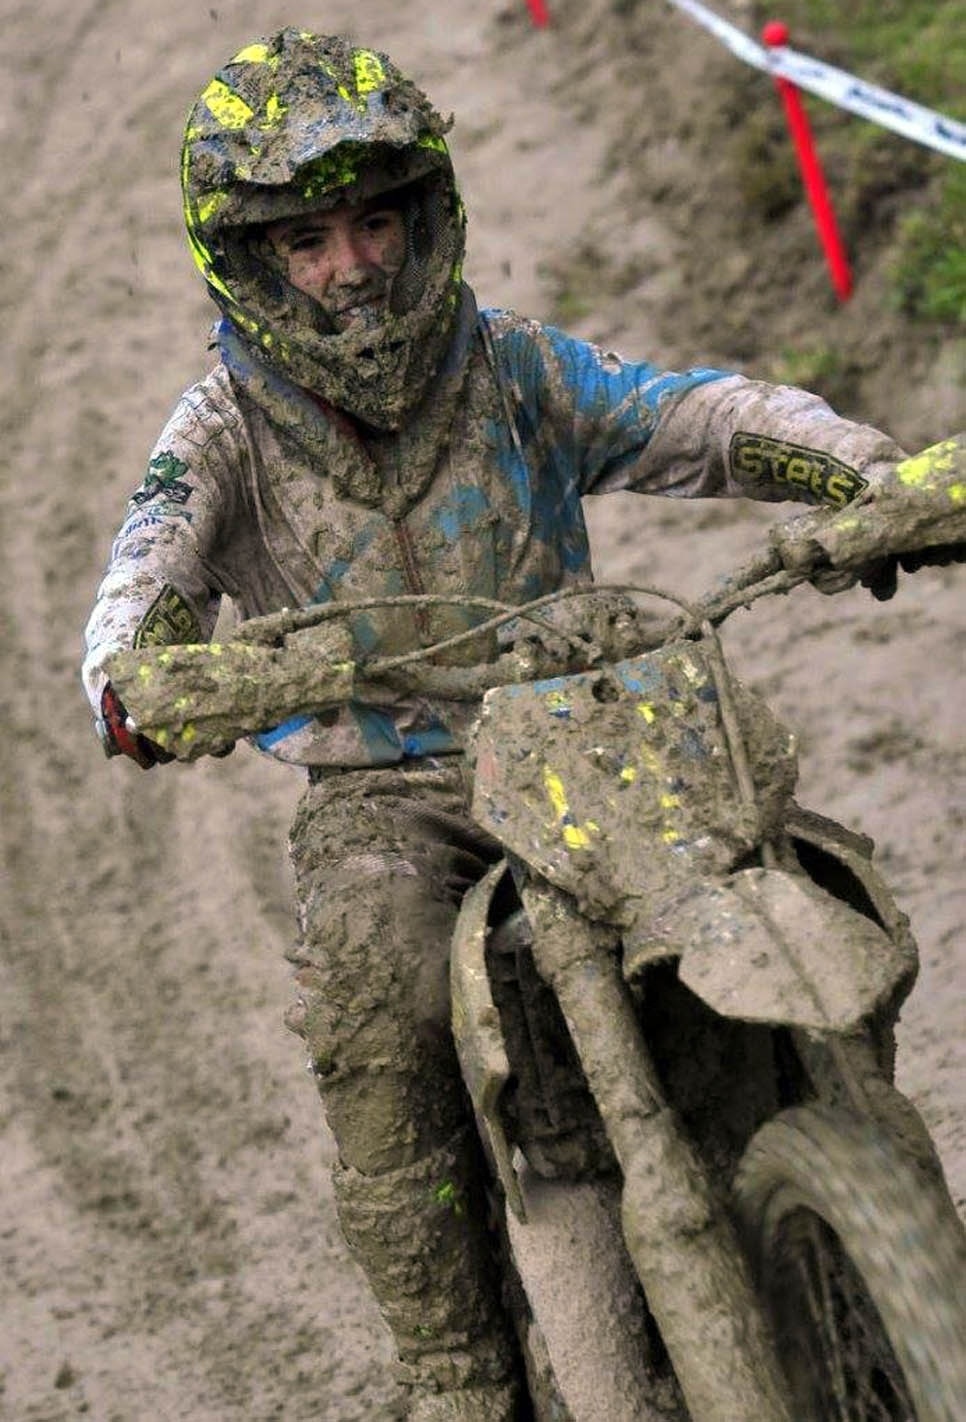 Steels Motocross, Morgan Bennati terzo ai campionati toscani